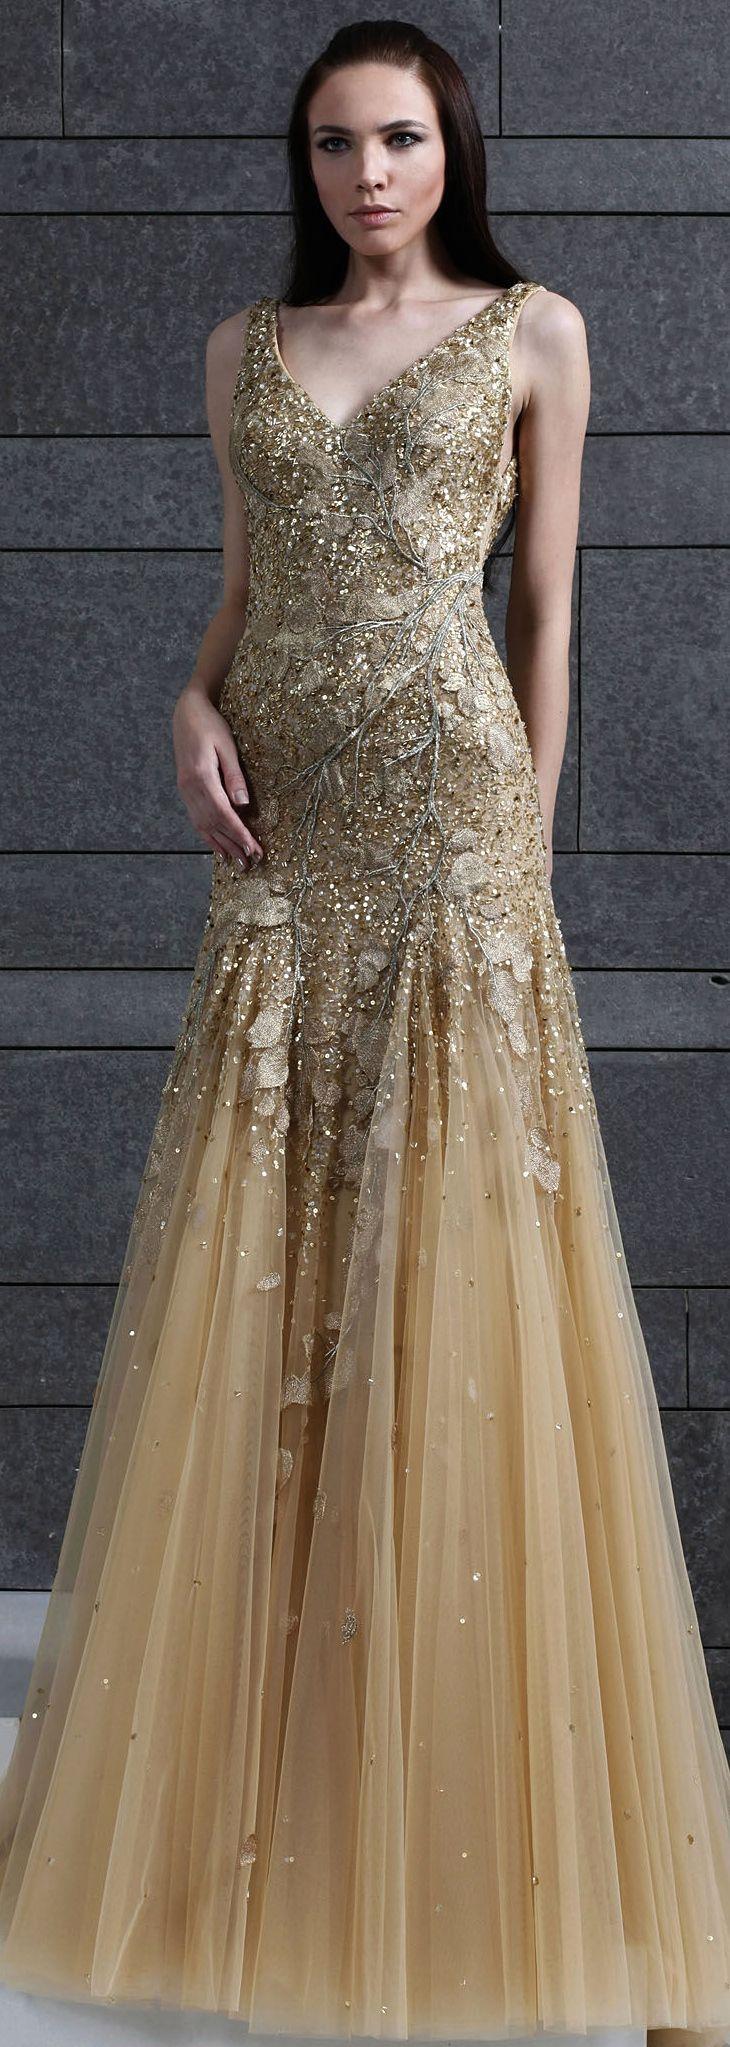 Tony brown evening dresses